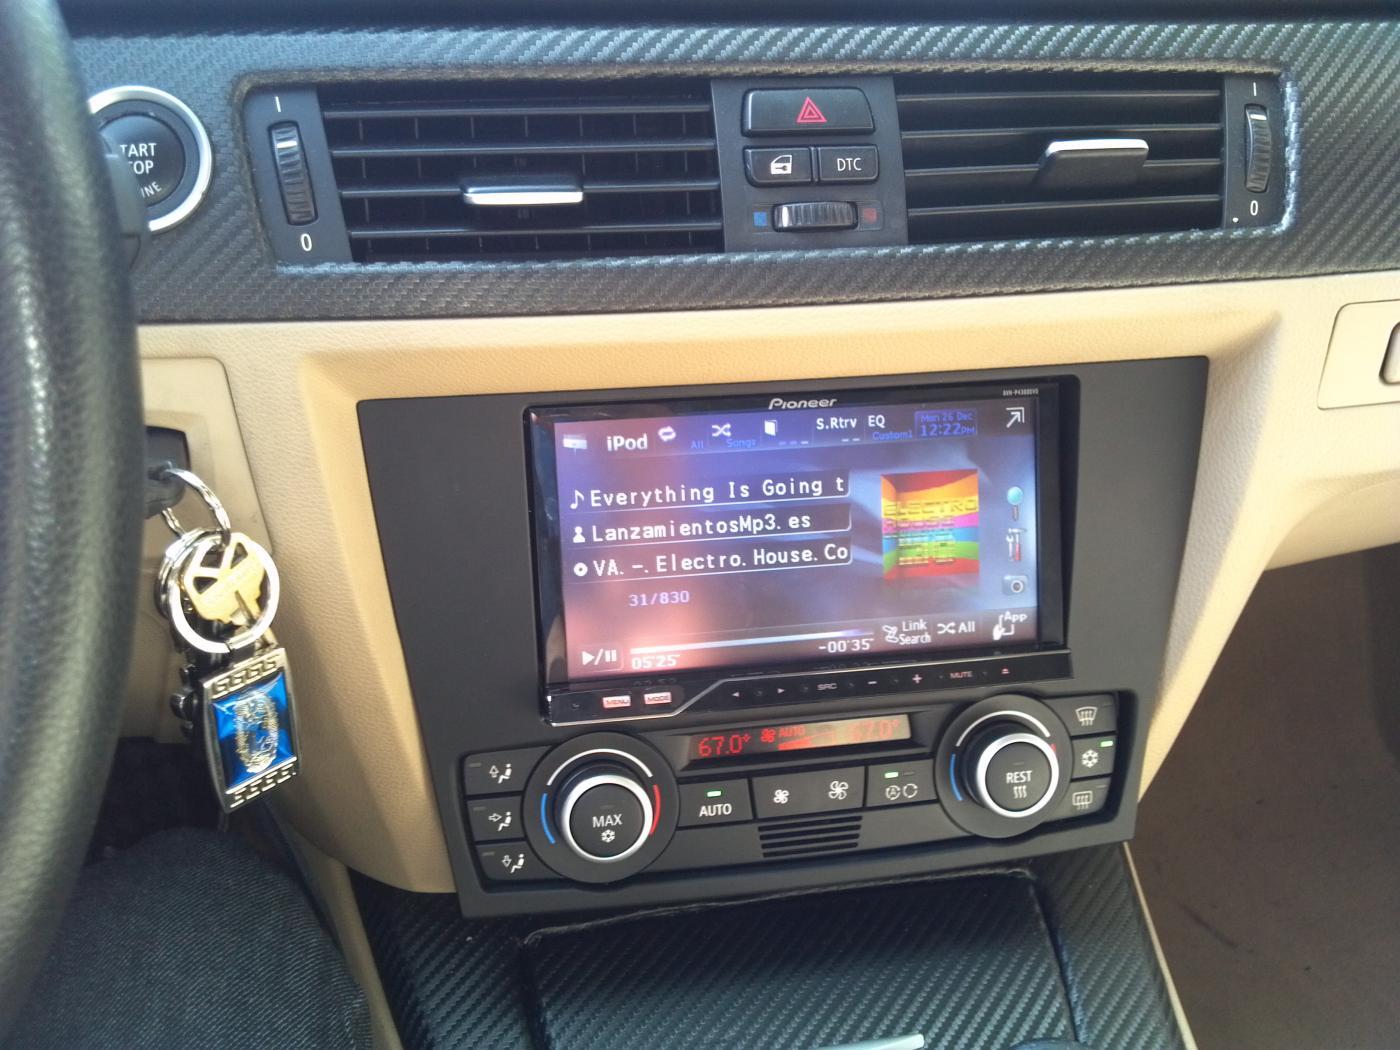 New Aftermarket Radio Installed Pics